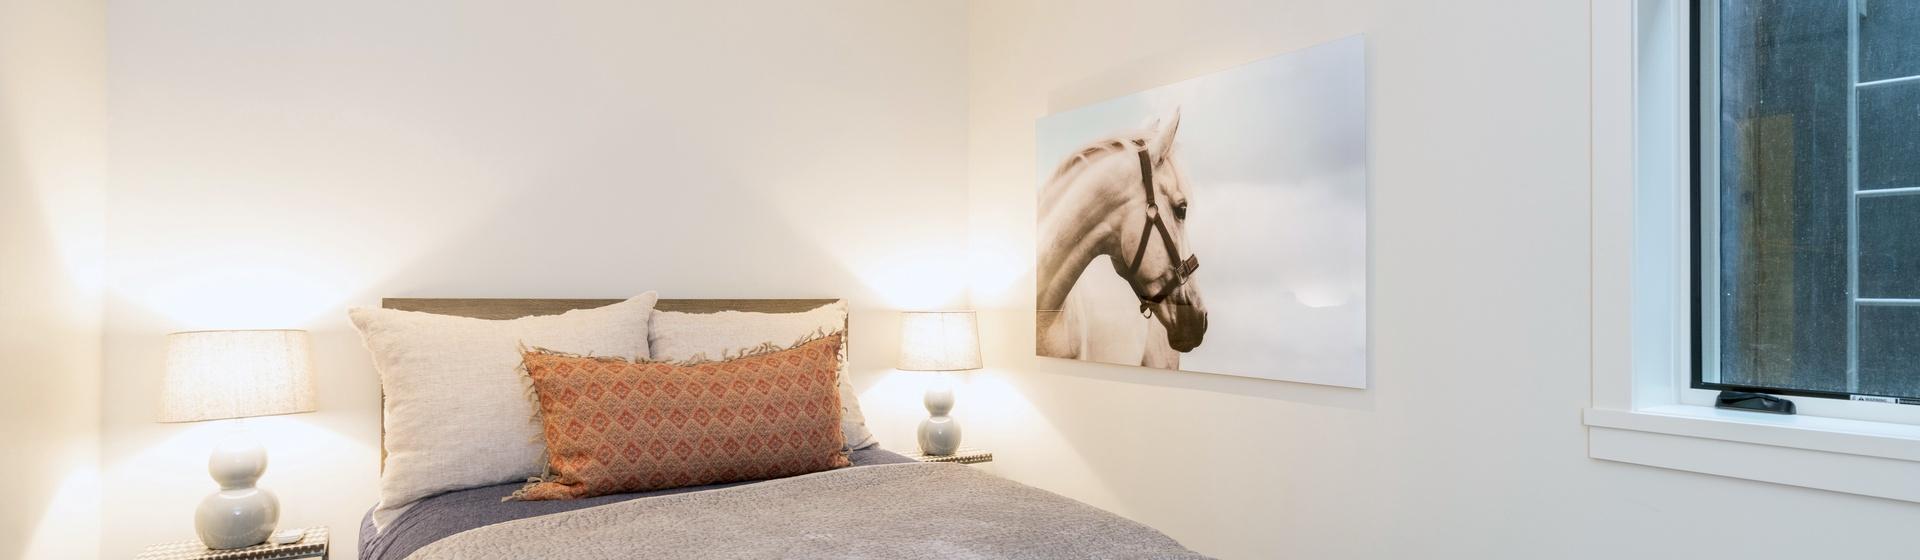 42-Telluride-Vacation-Rental-Cloud-Nine-Cottage-Guest-Bedroom-1